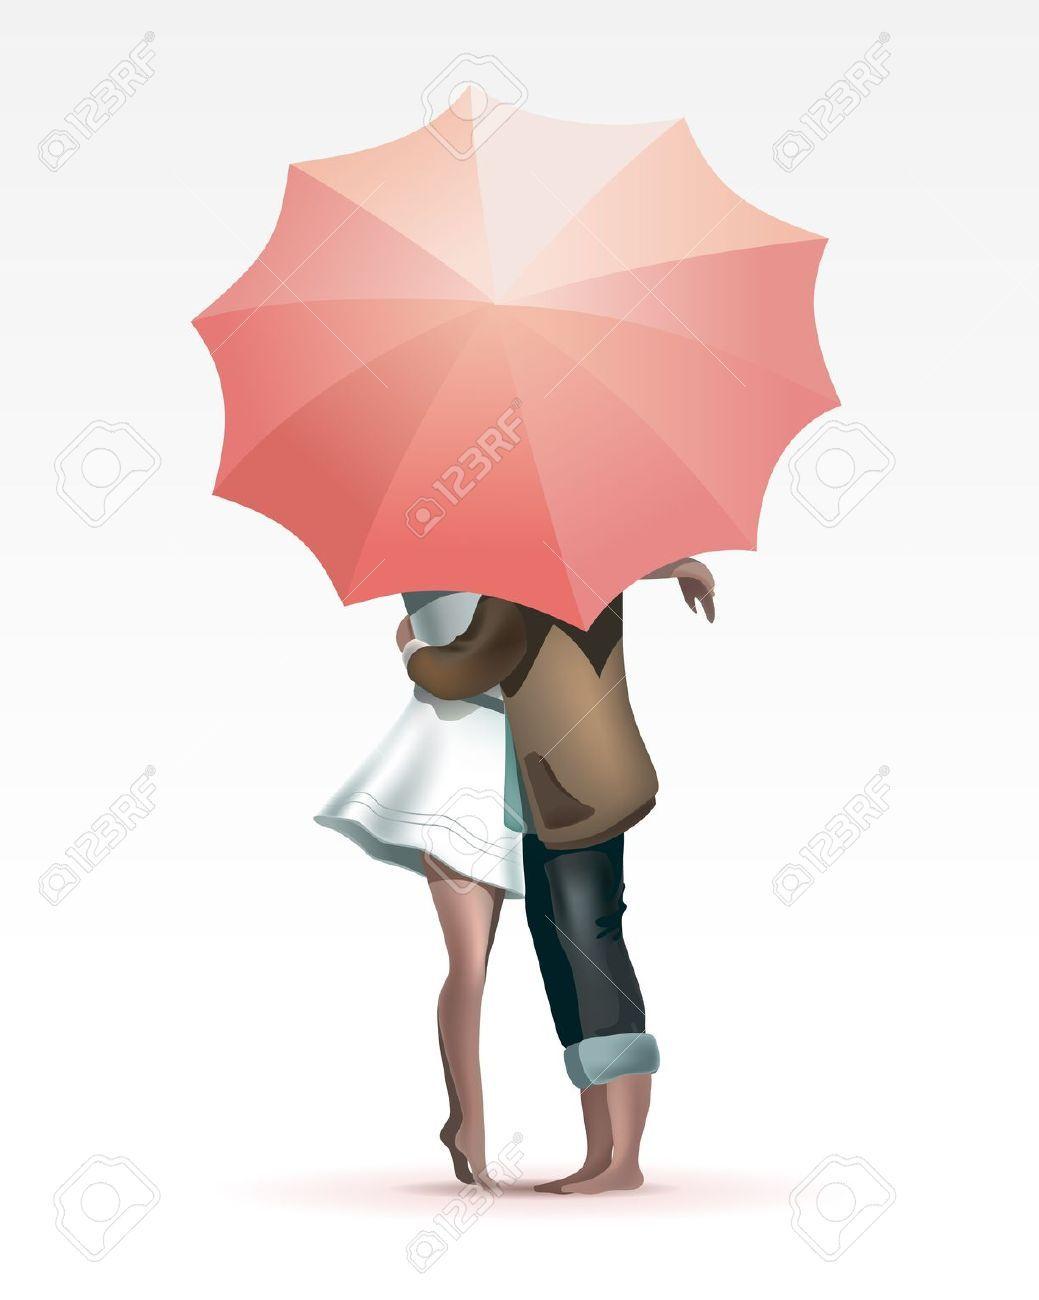 Couple Kissing Under Umbrella Silhouette